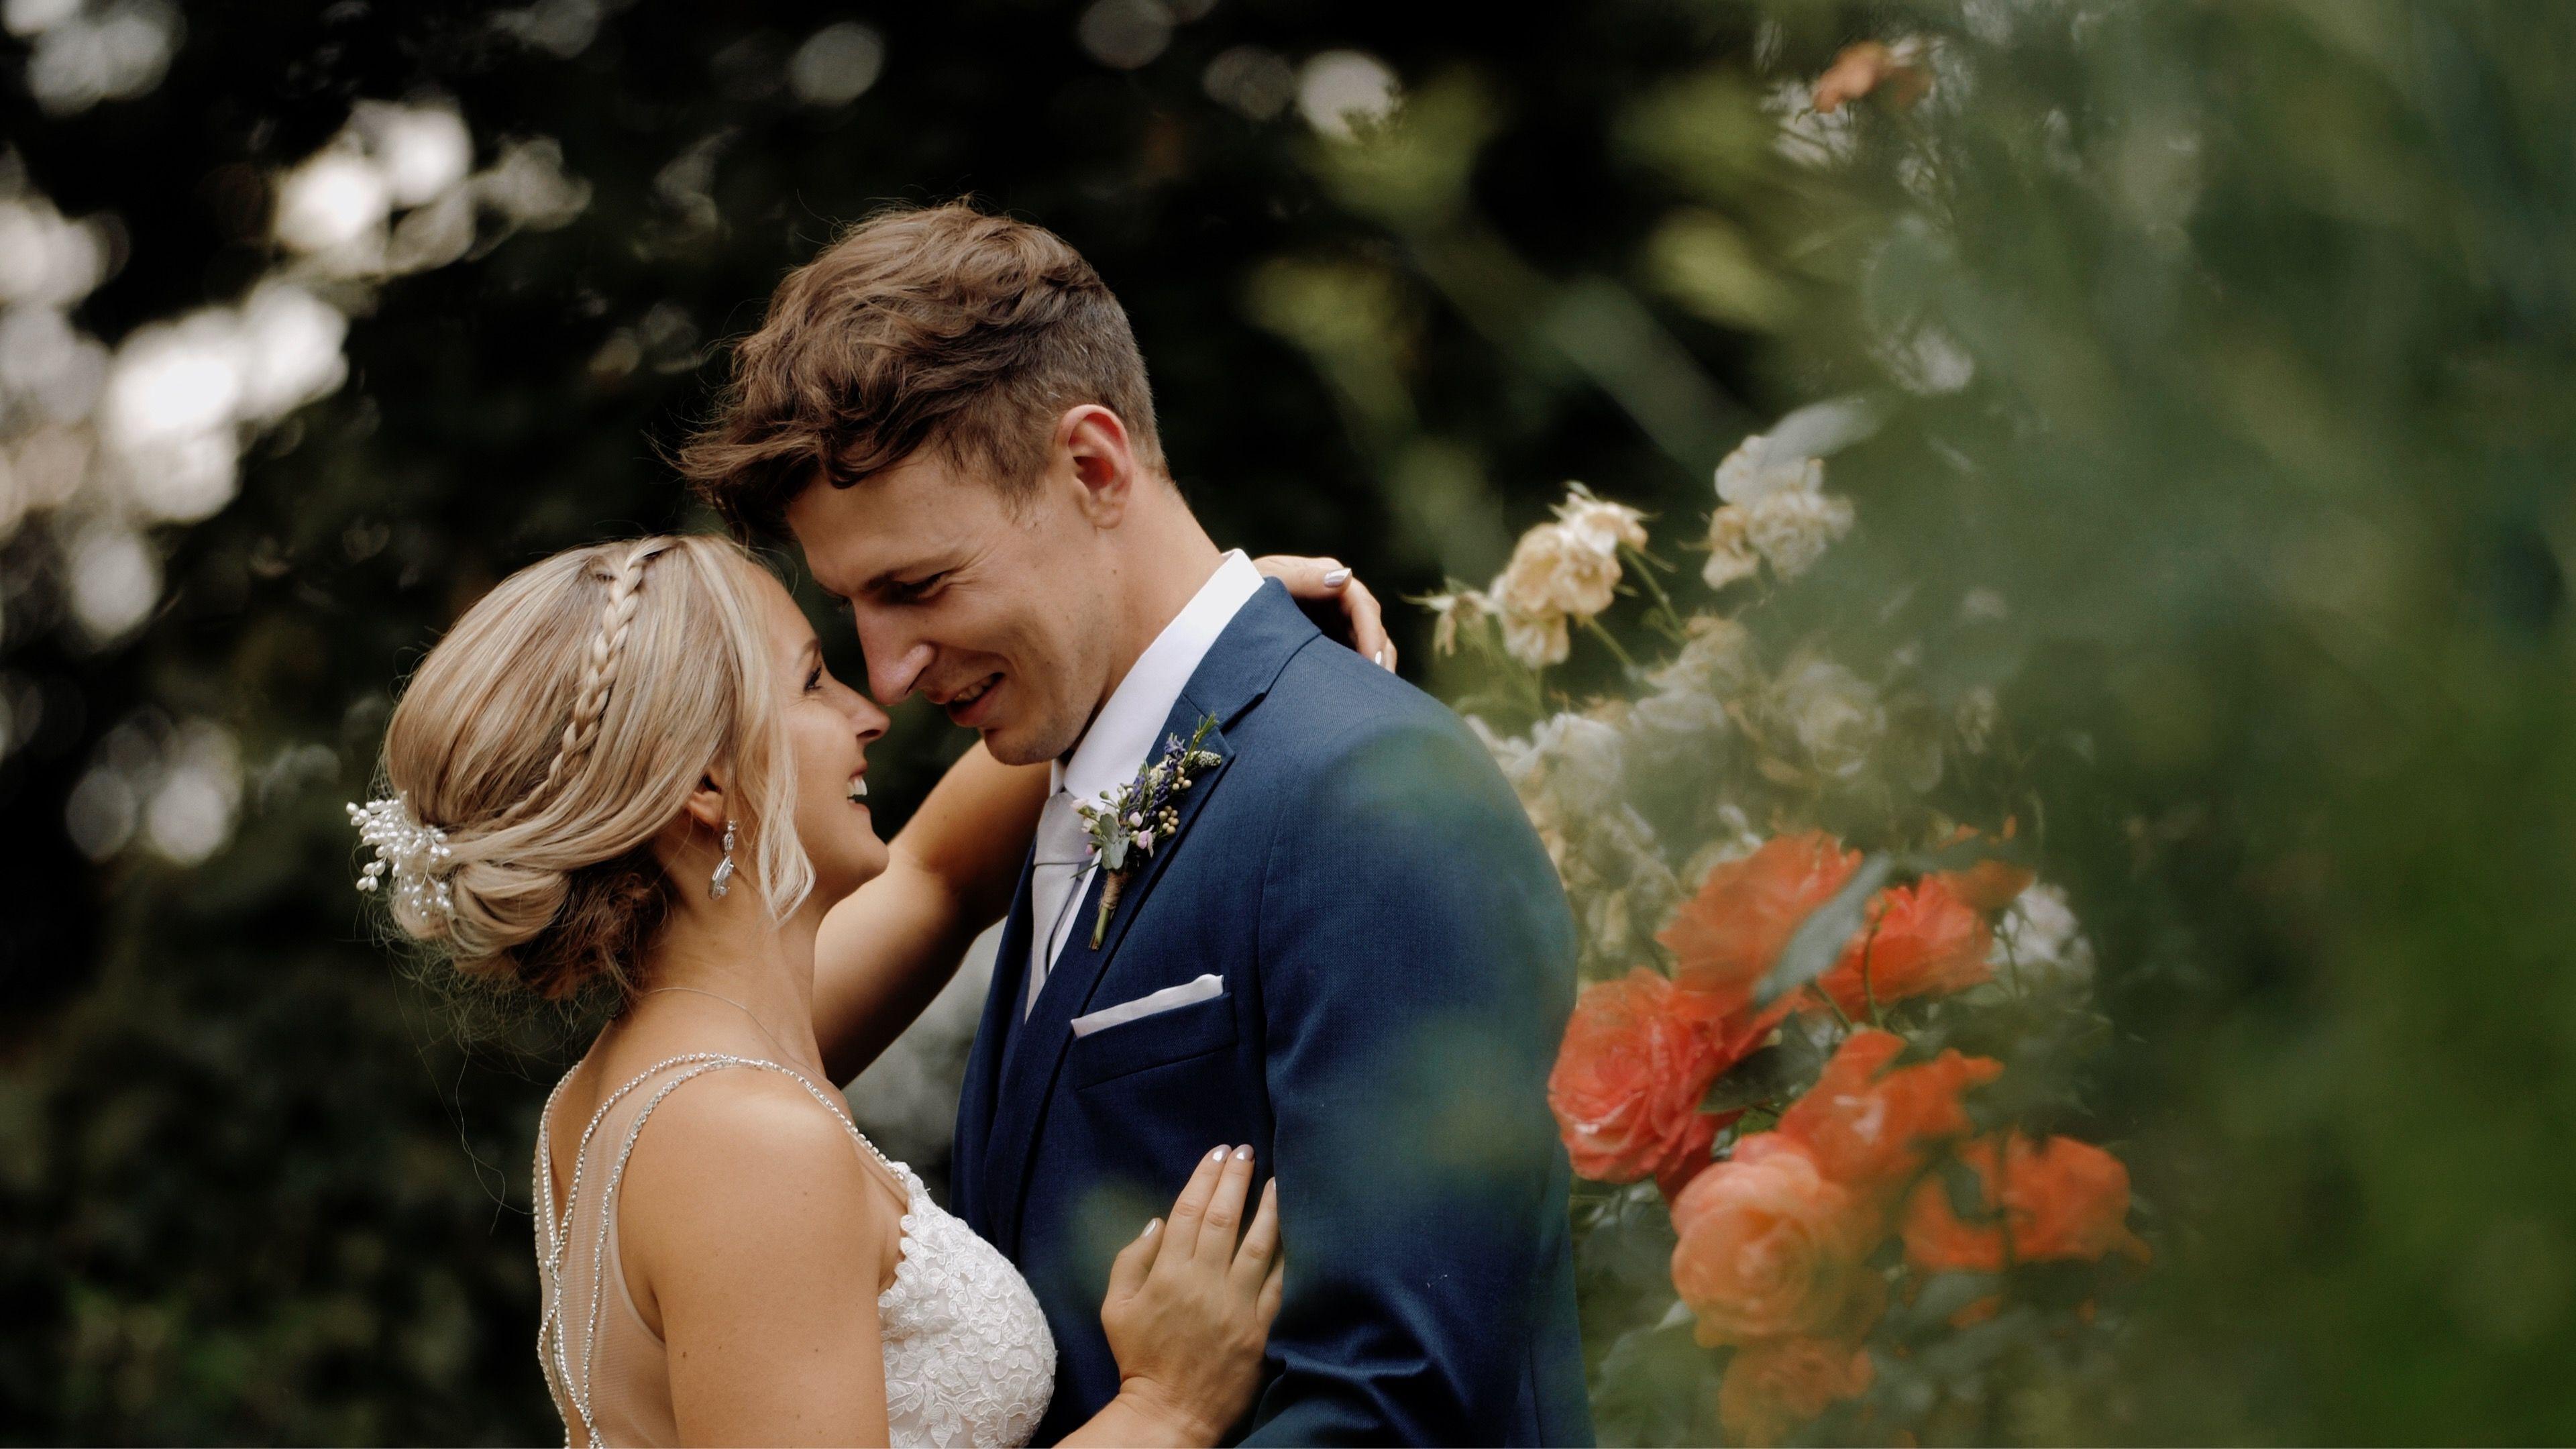 A beautiful stylish wedding held at Park Farm in